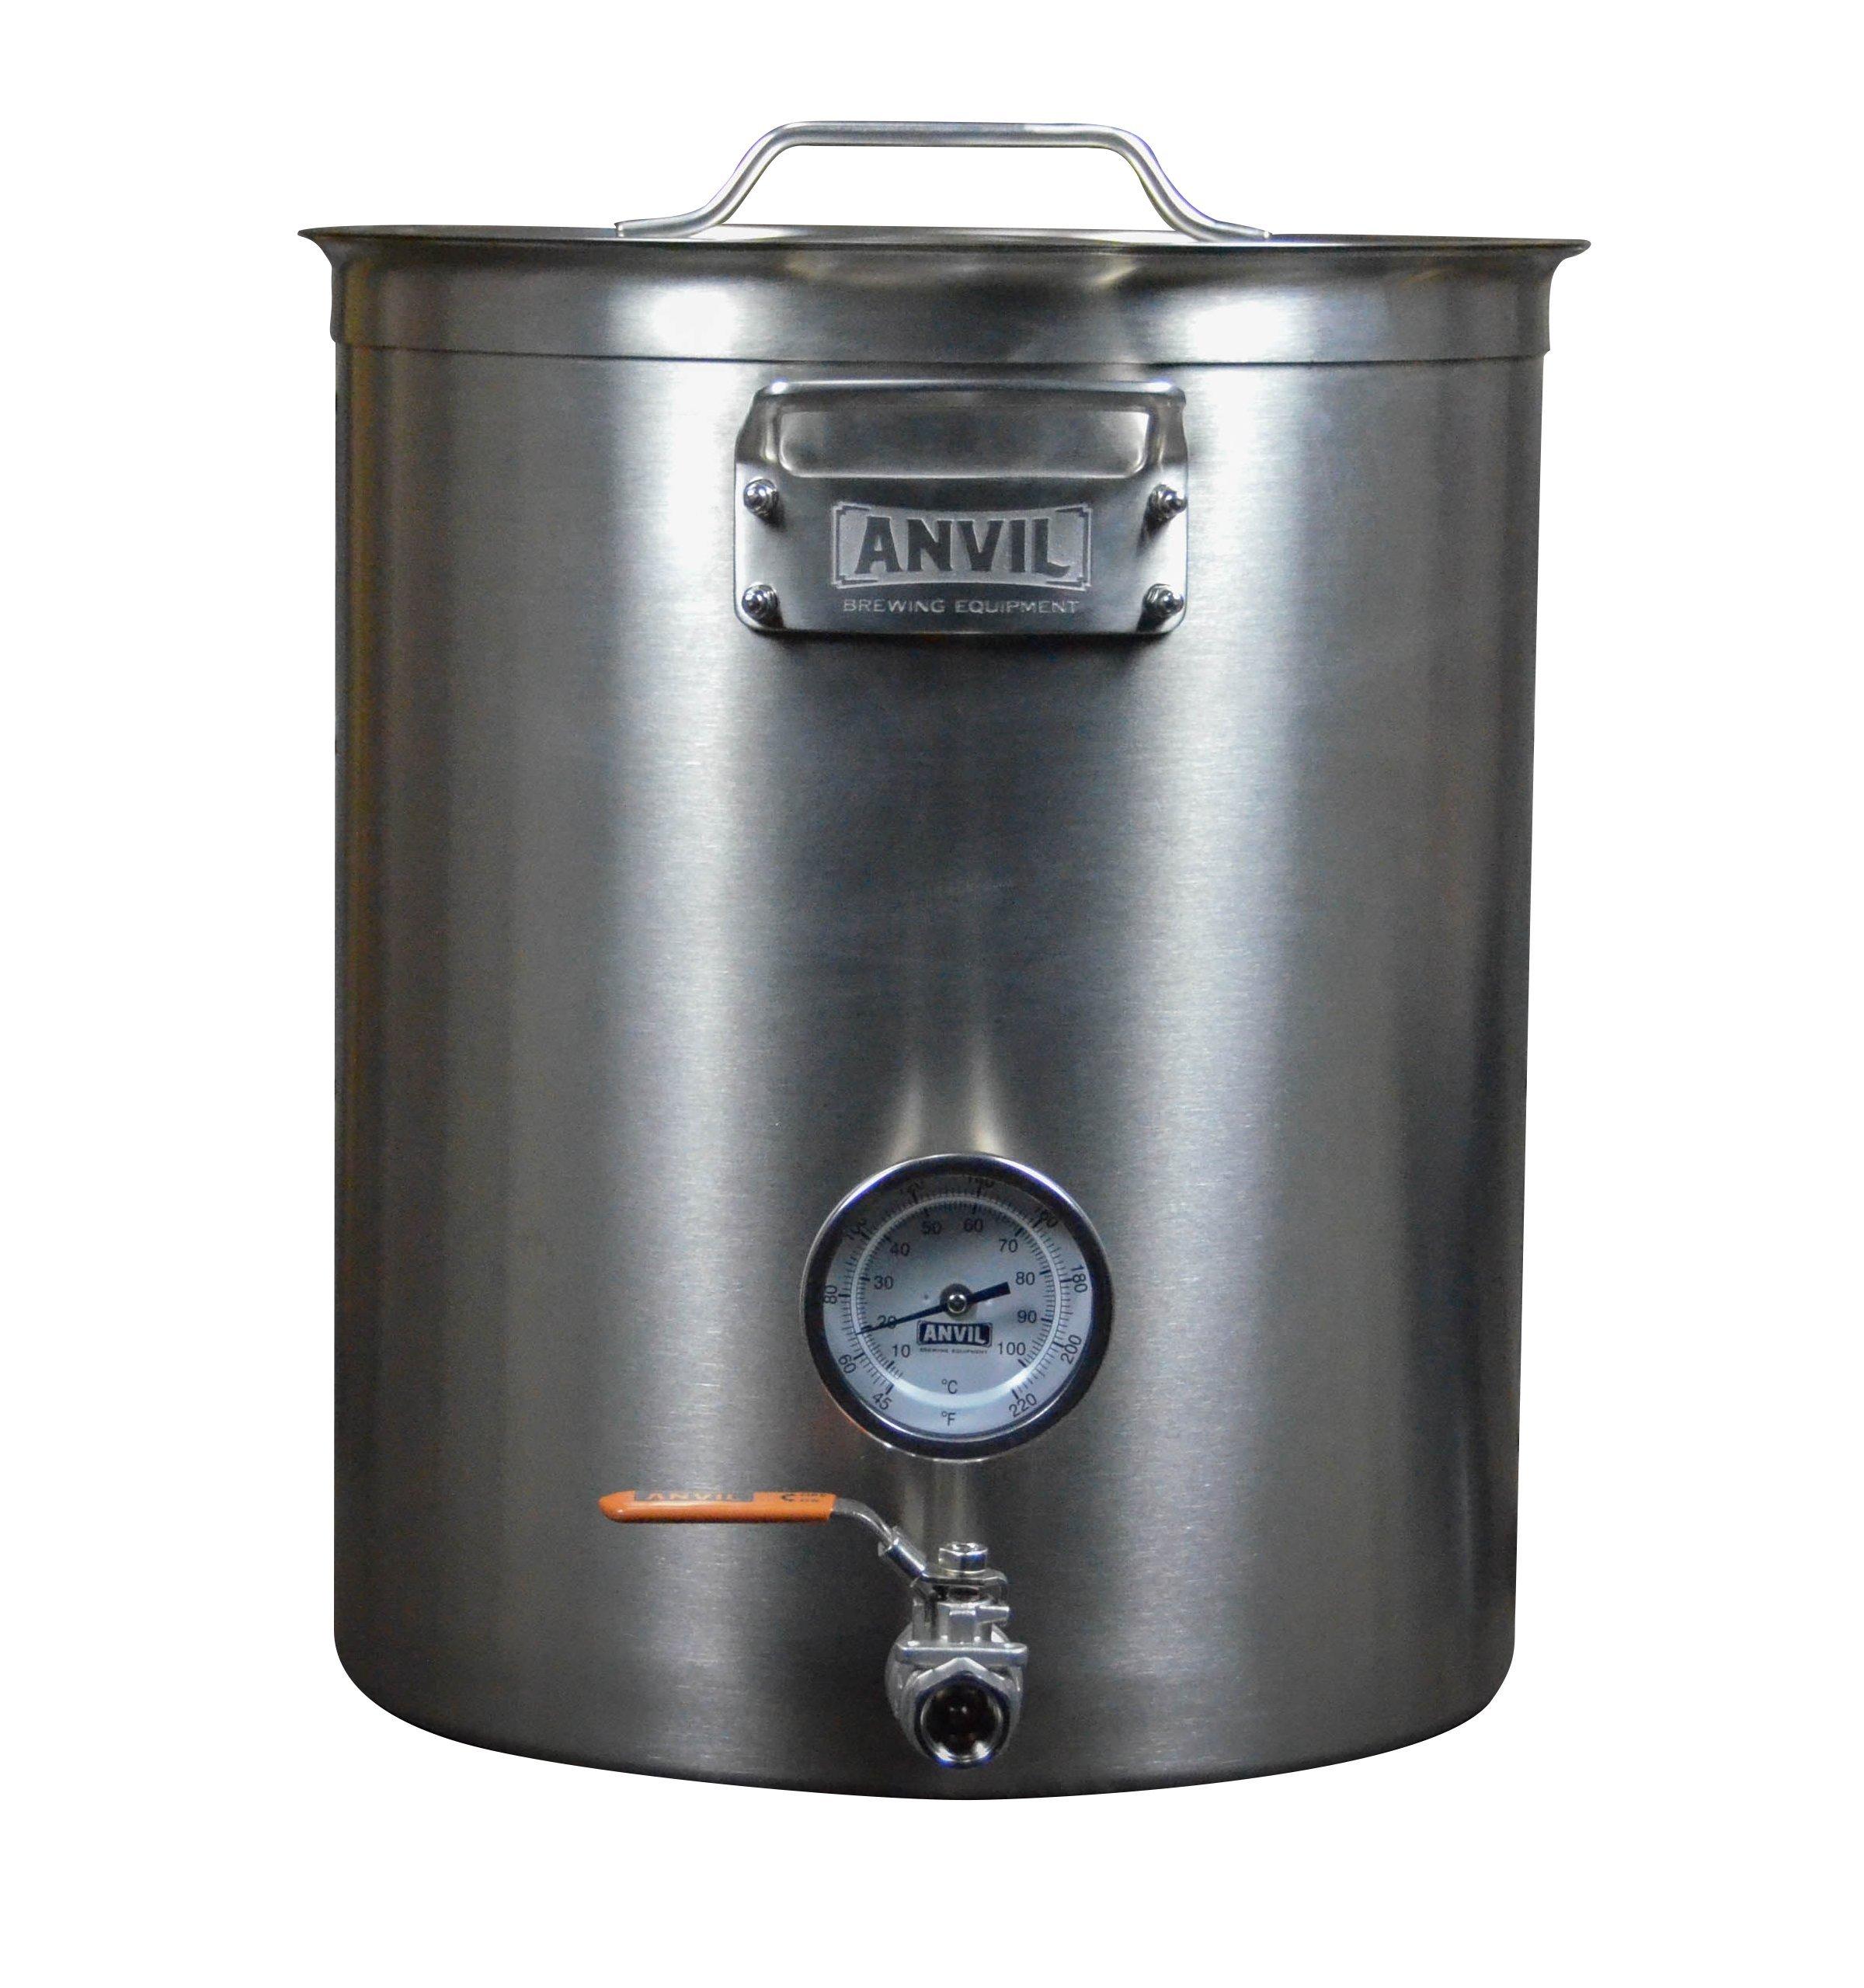 Anvil Brew Kettle, 10 gal by Anvil (Image #1)